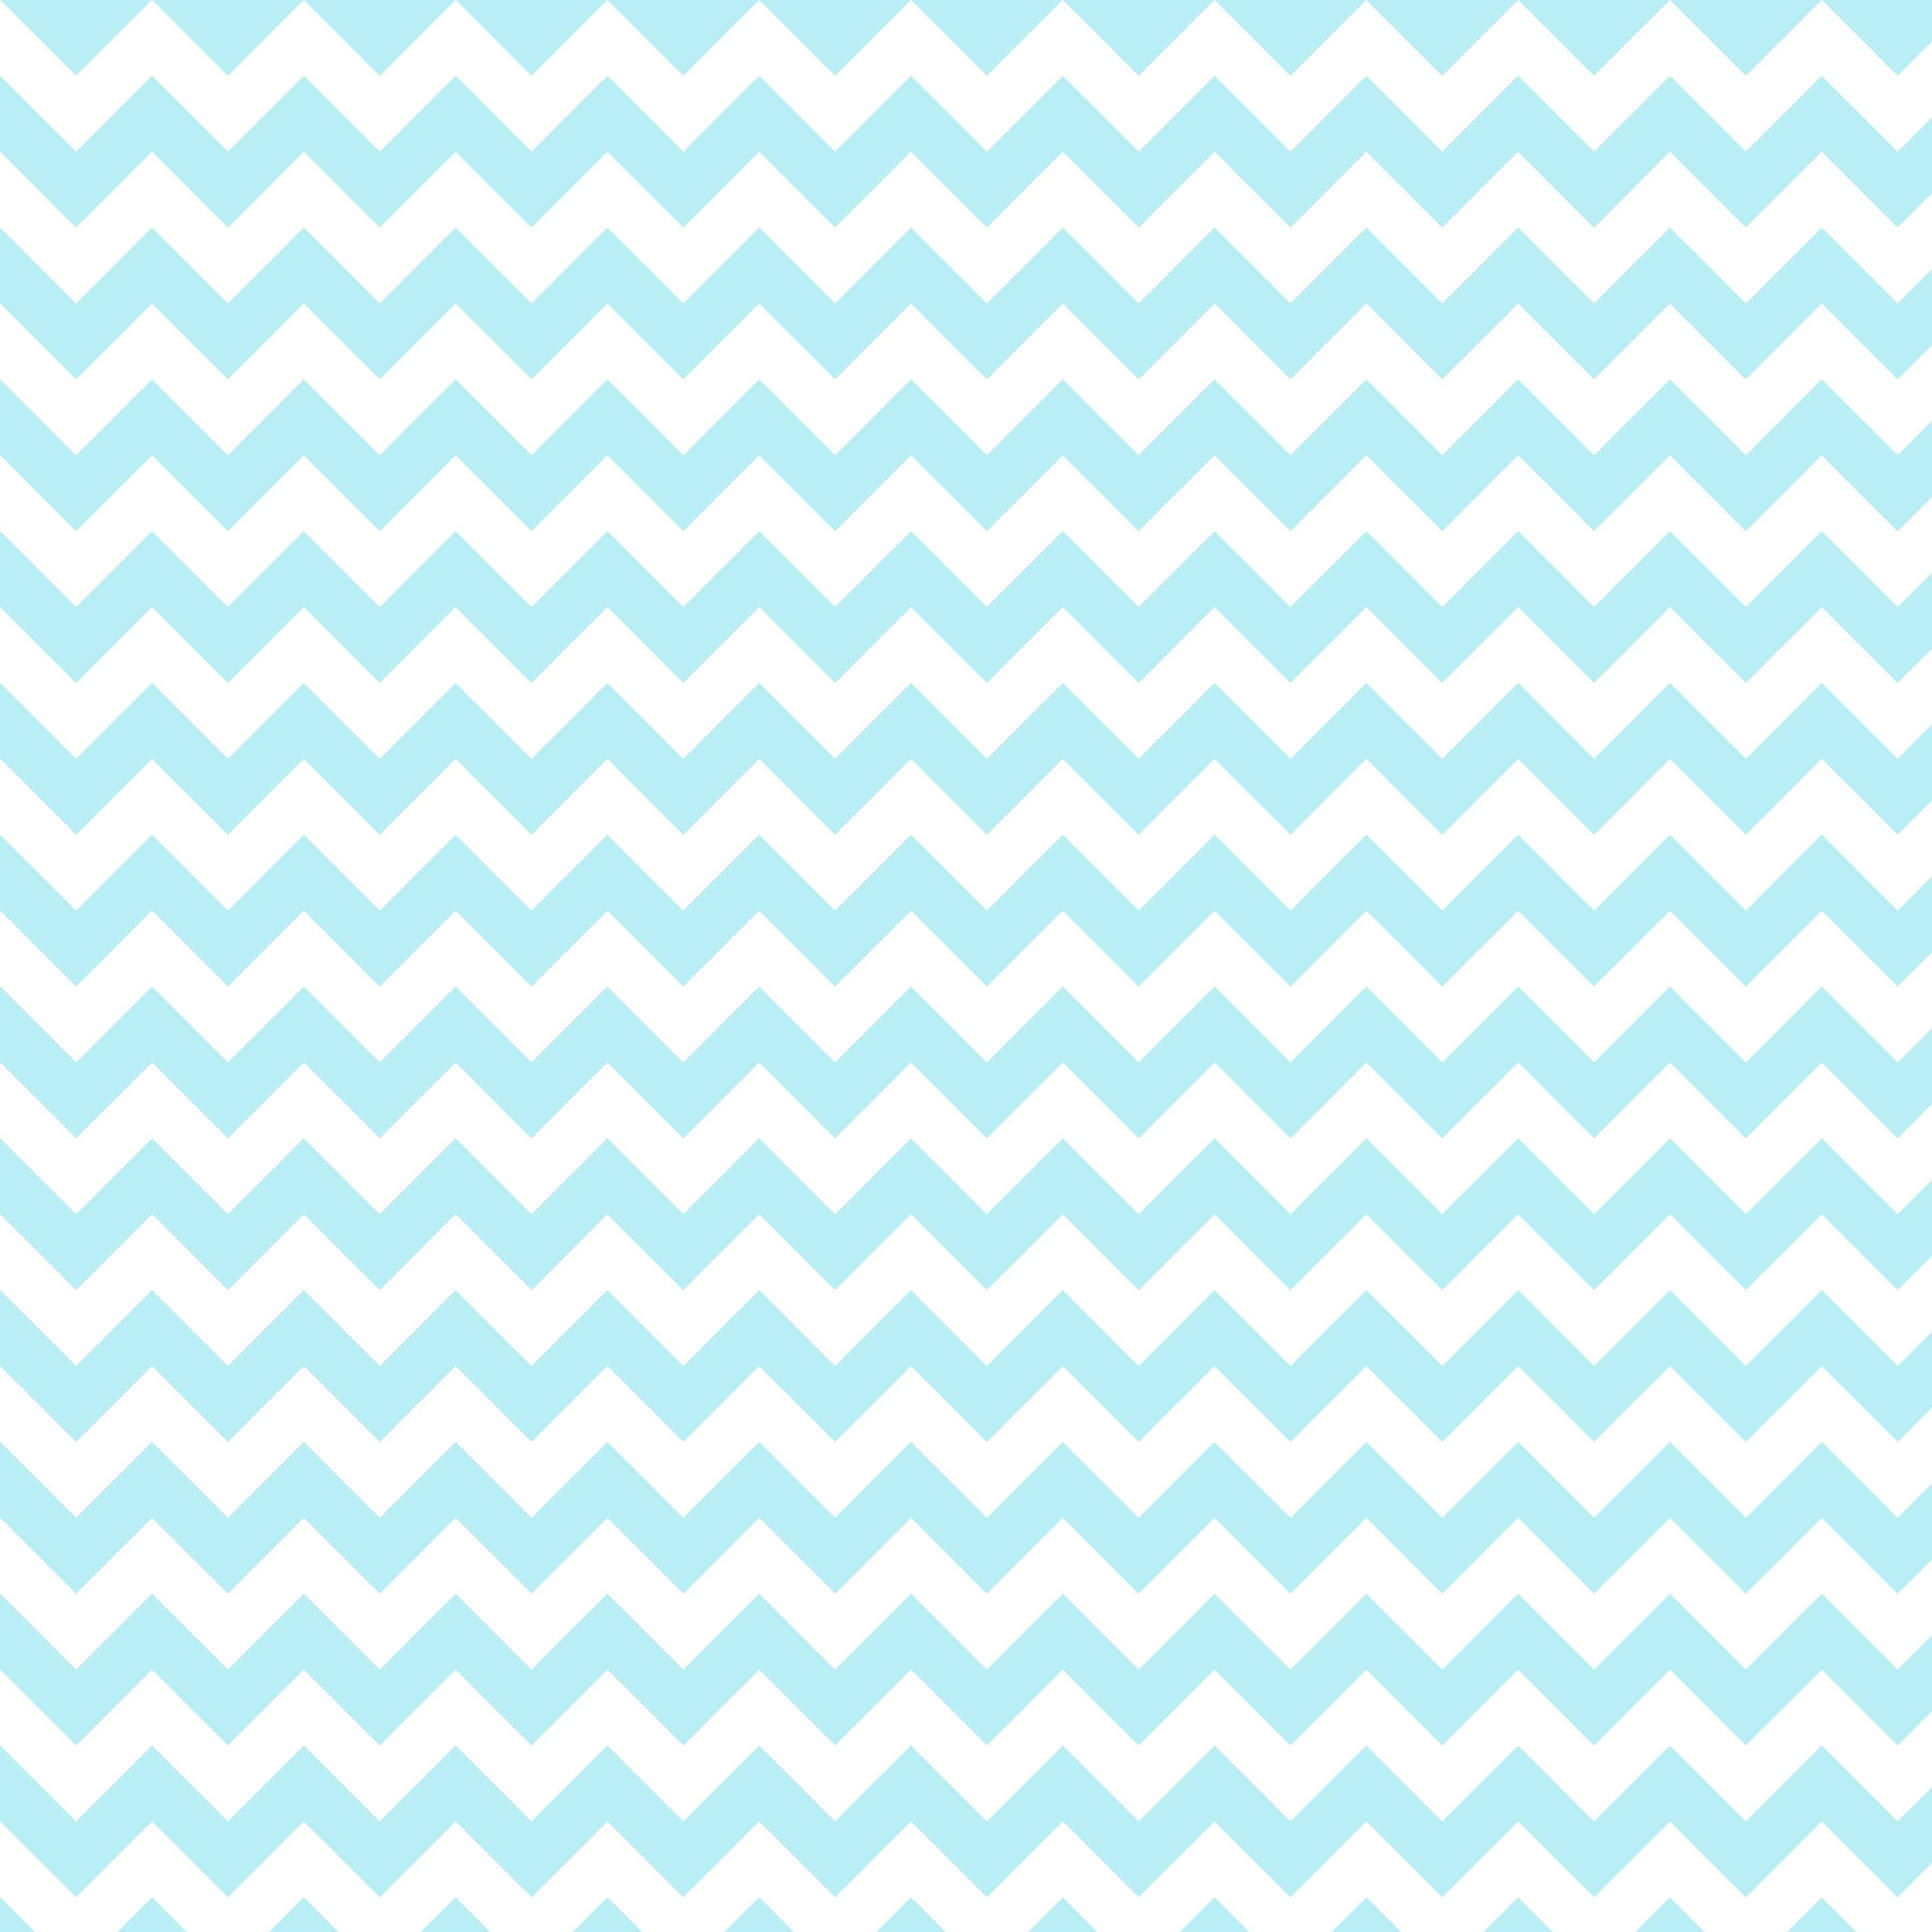 Pastel Chevron Digital Paper-Seamless example image 4